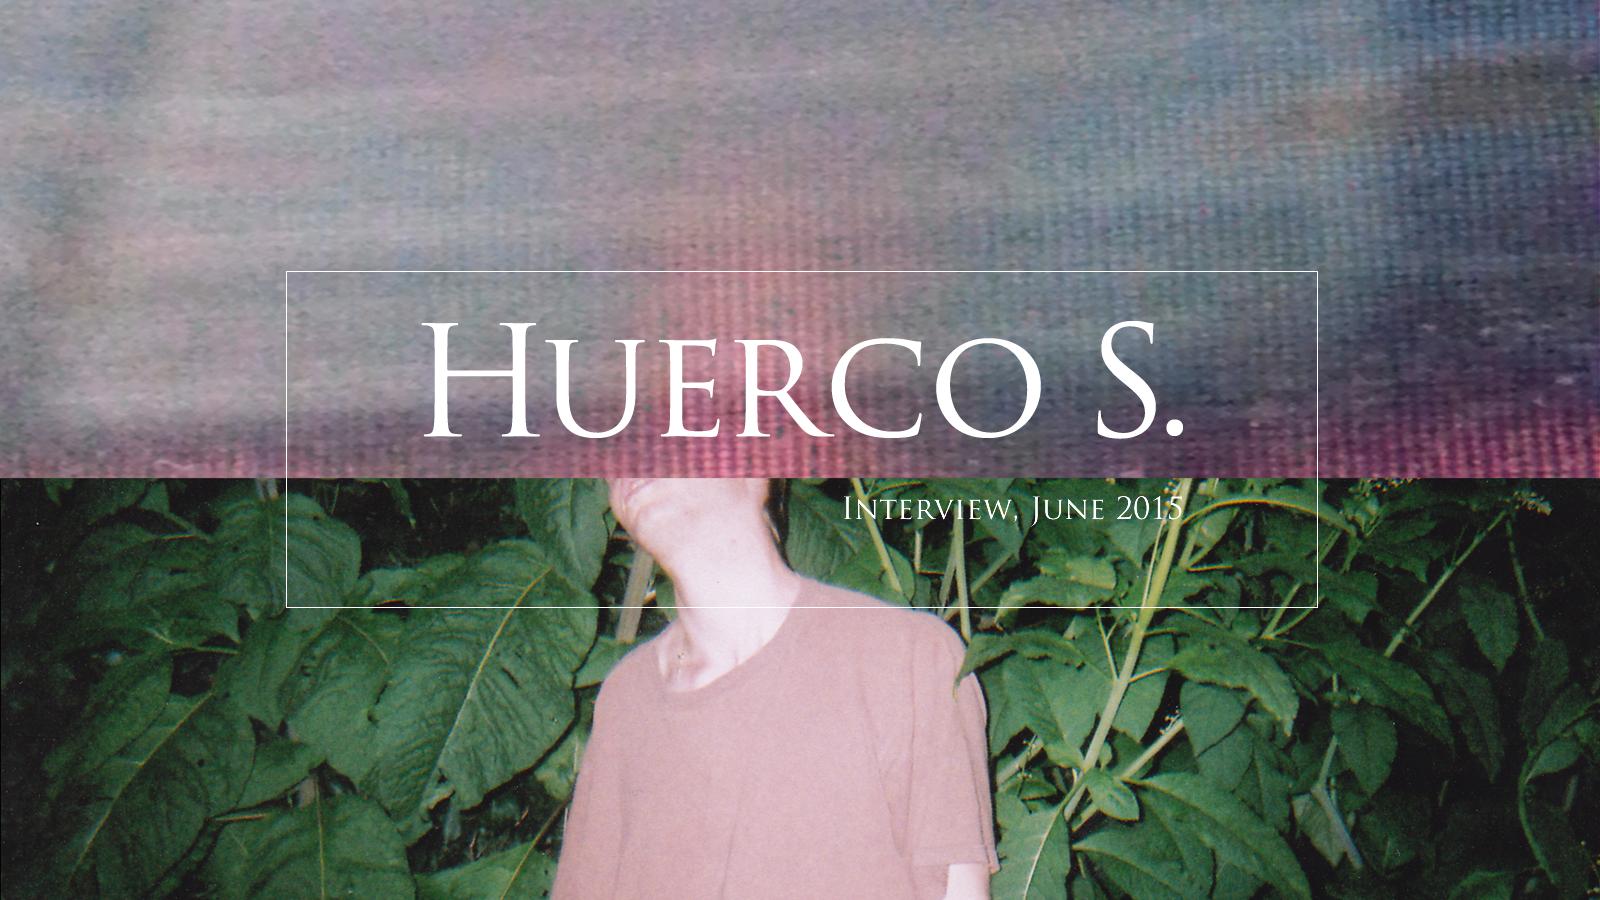 Huerco S.